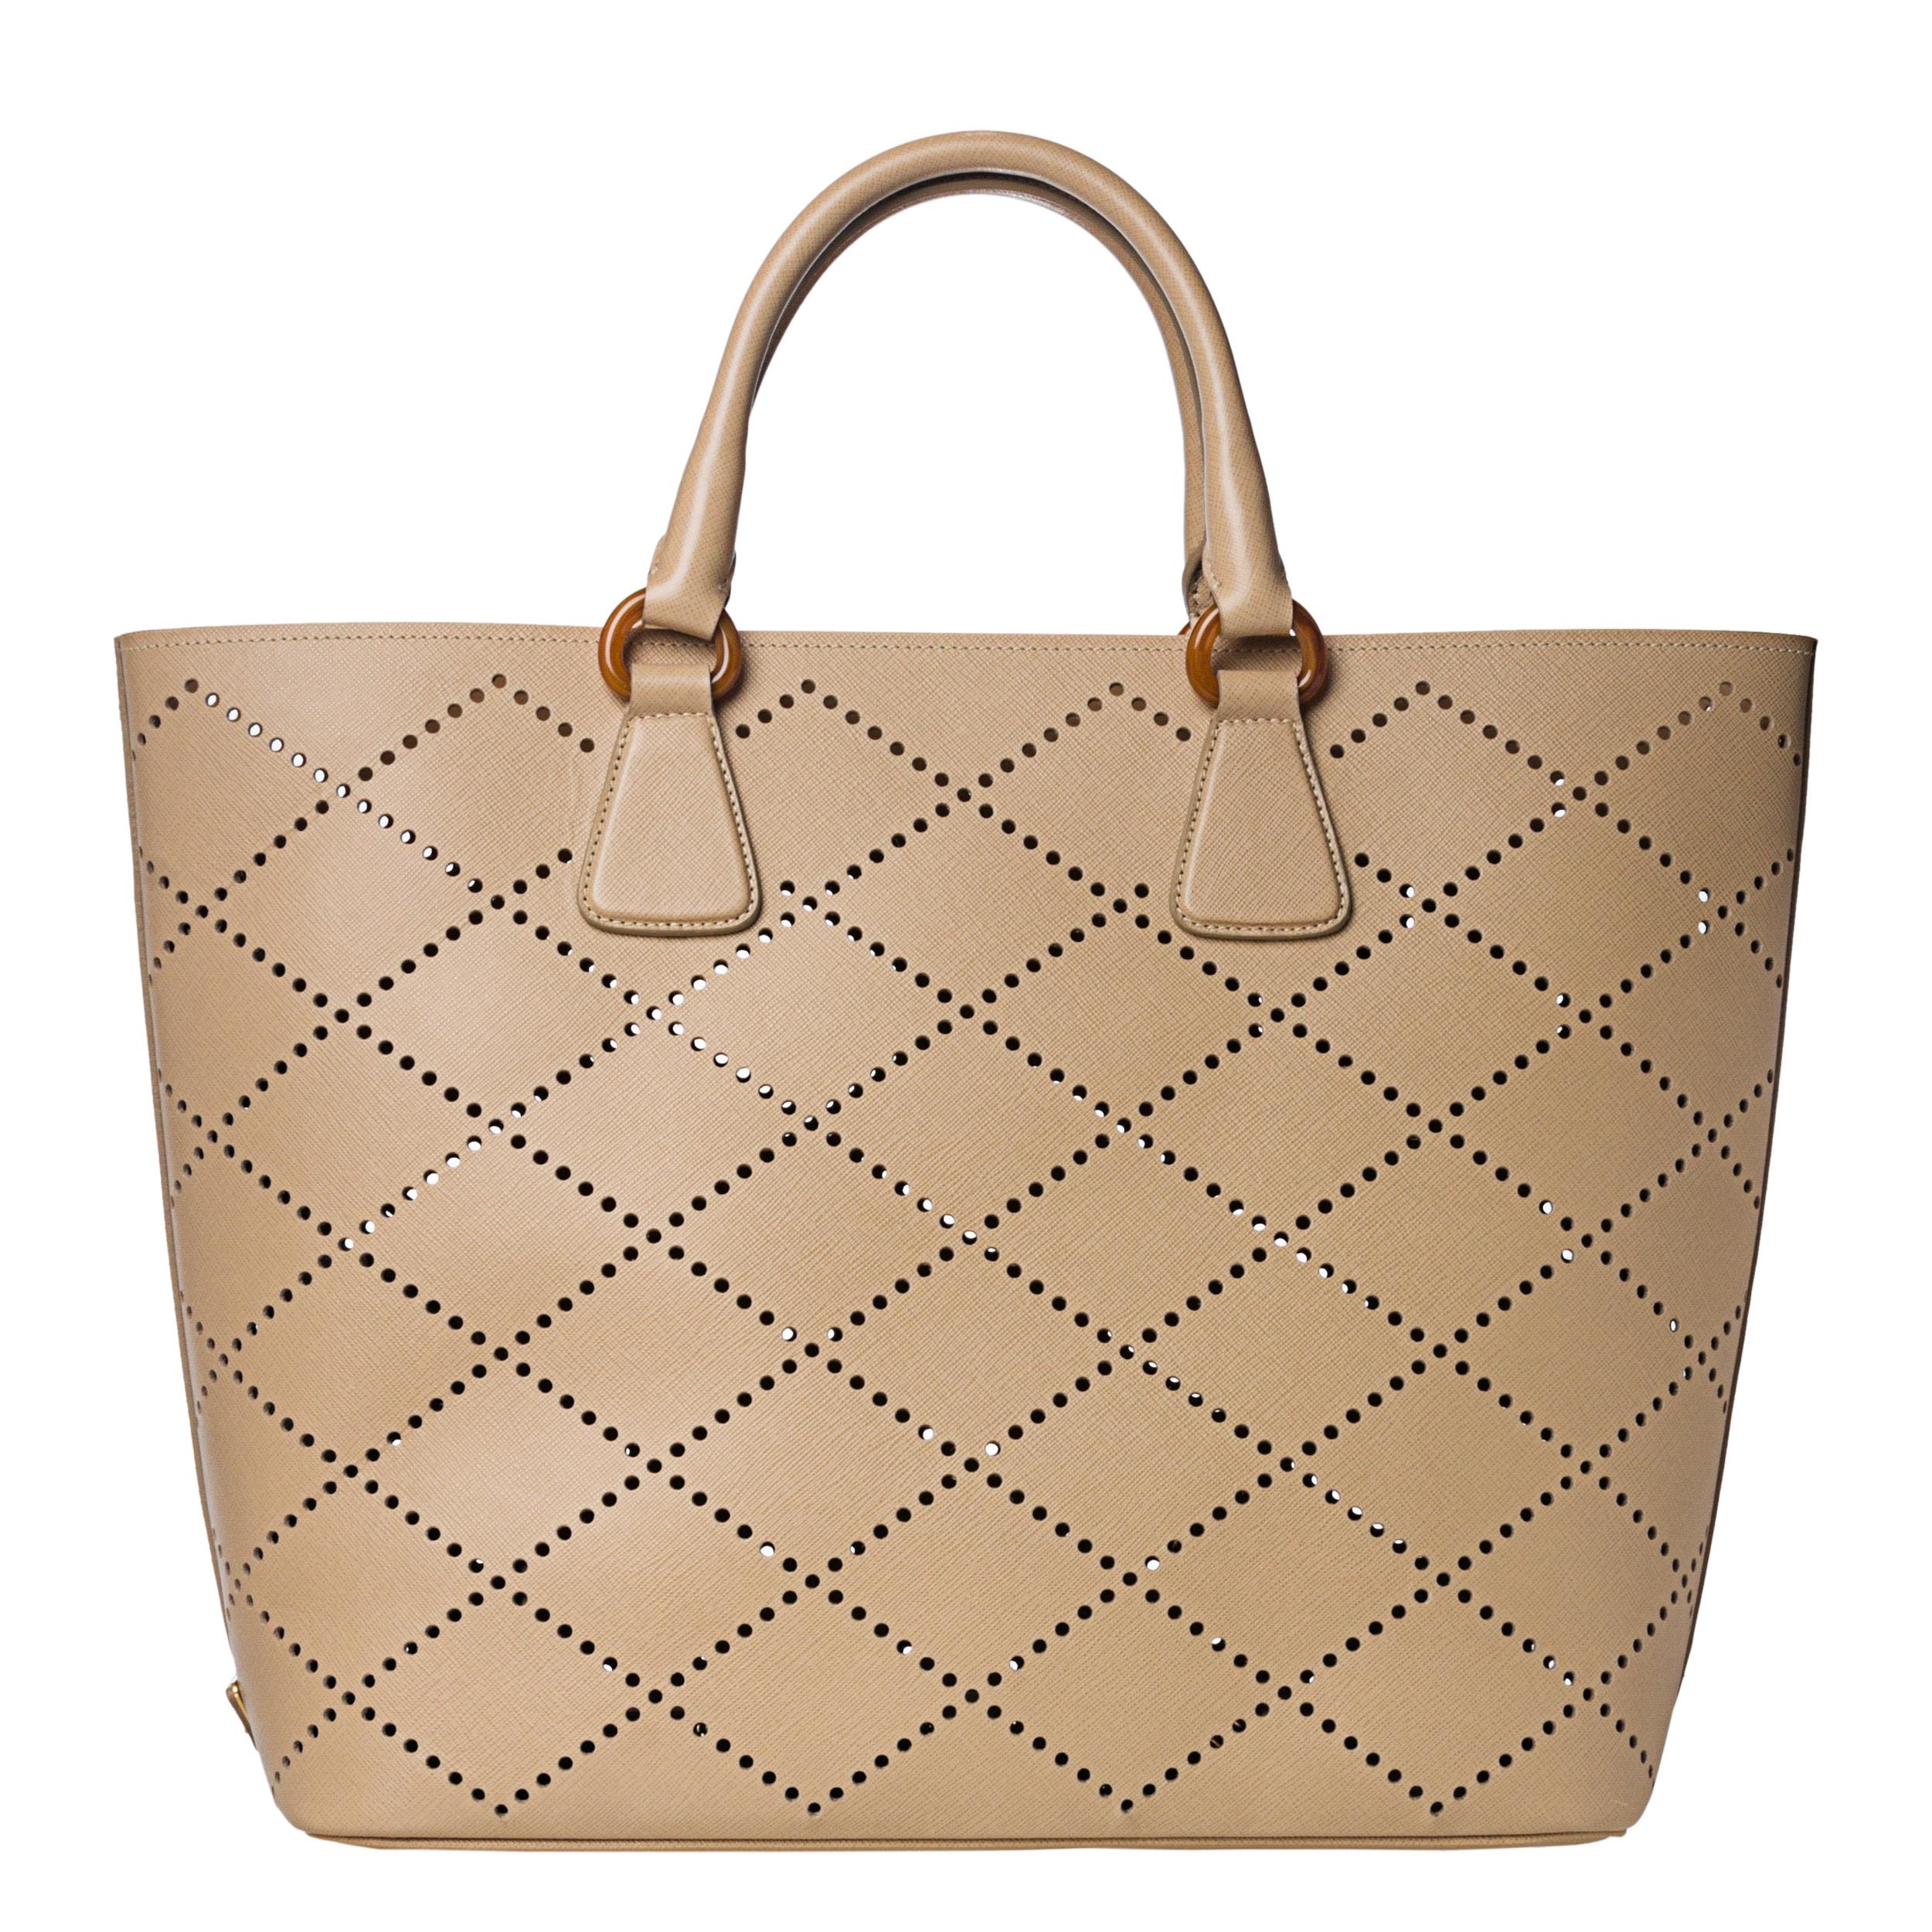 4be49381f21572 ... authentic prada large beige perforated saffiano leather tote bag ed6ac  298e1